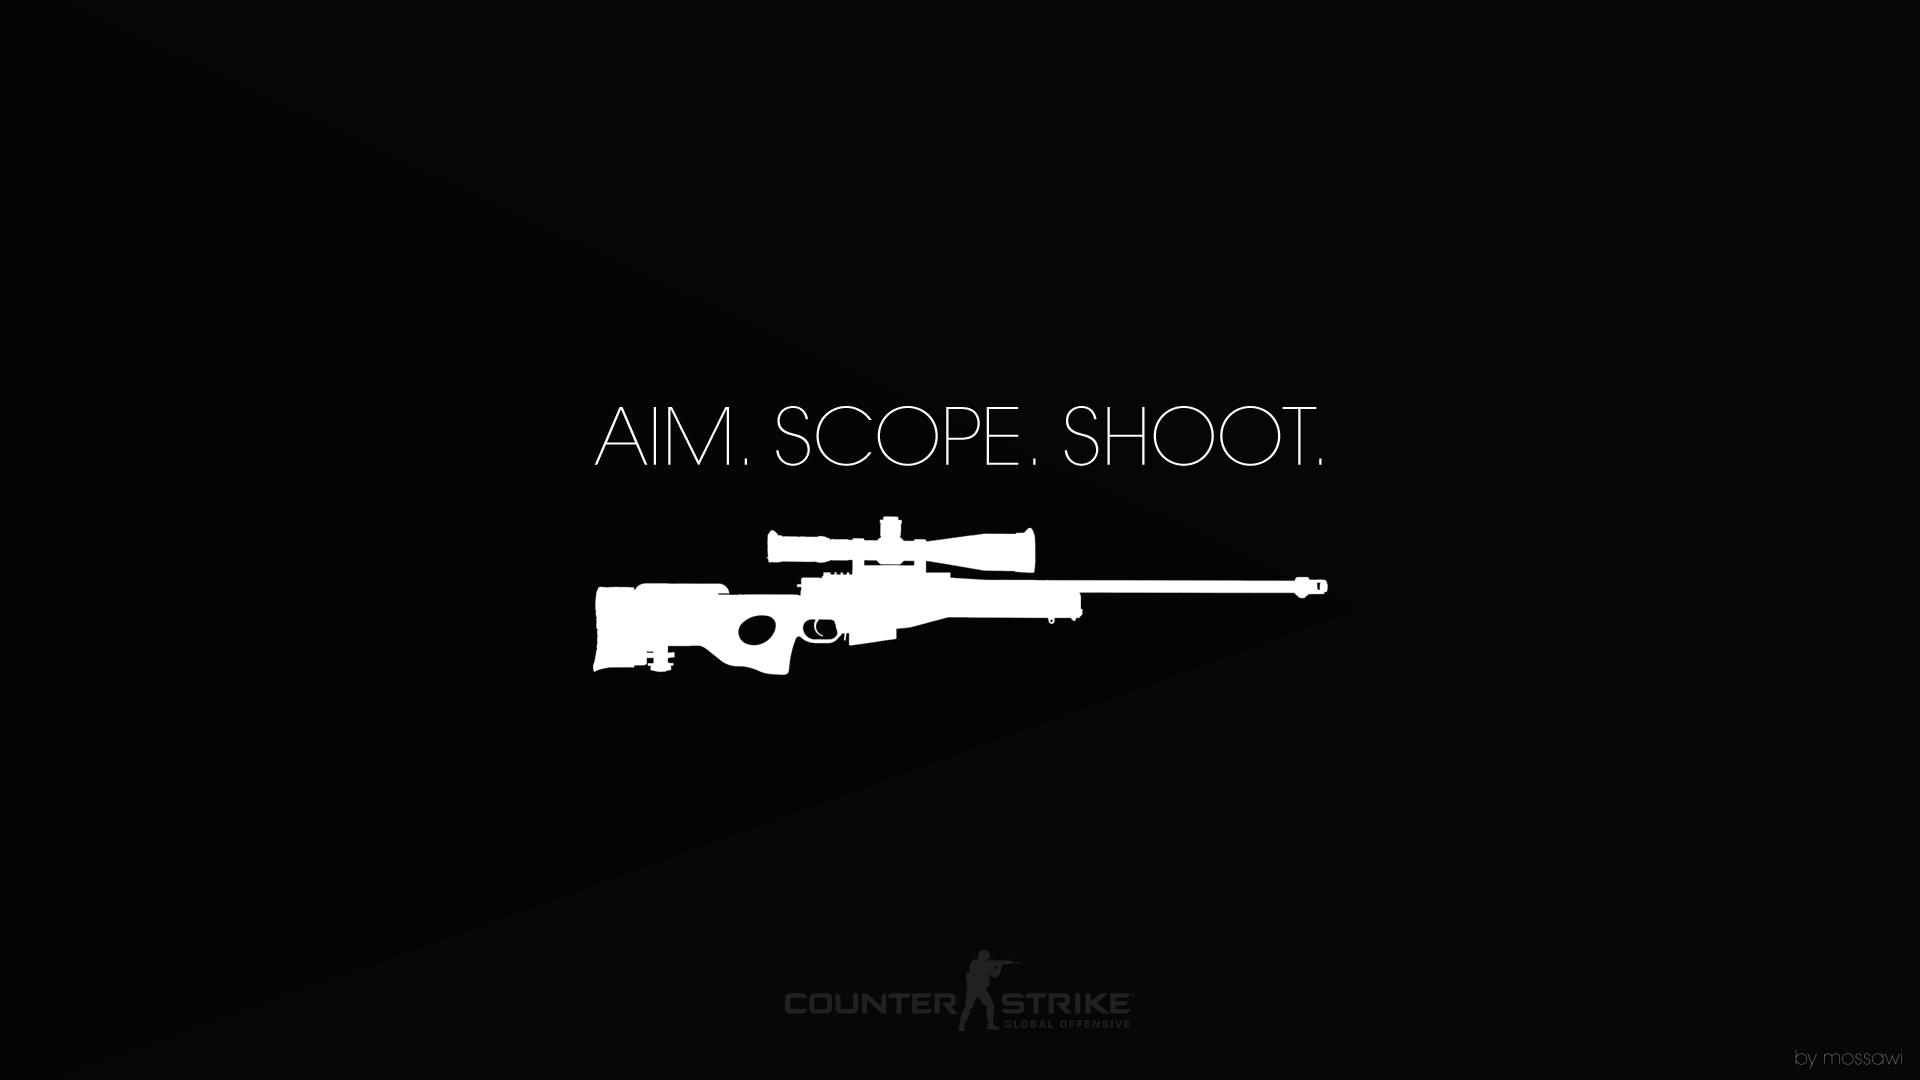 AIM. SCOPE. SHOOT.